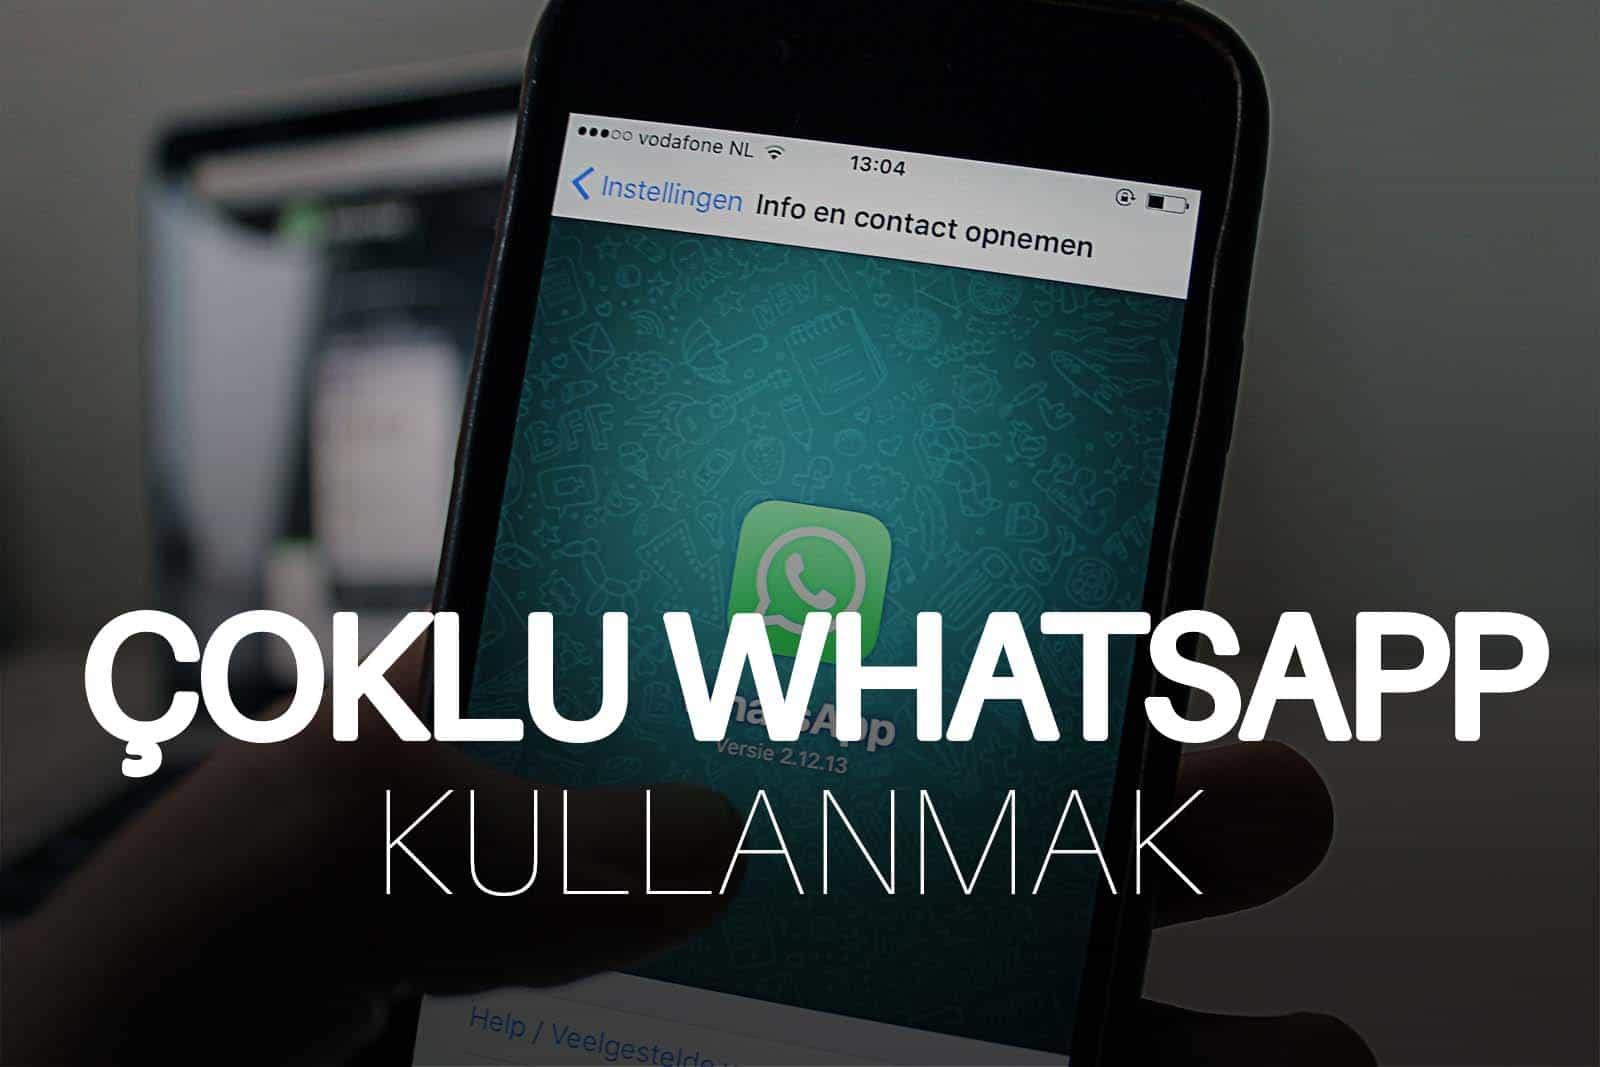 Bir Telefonda Çoklu Whatsapp Kullanma